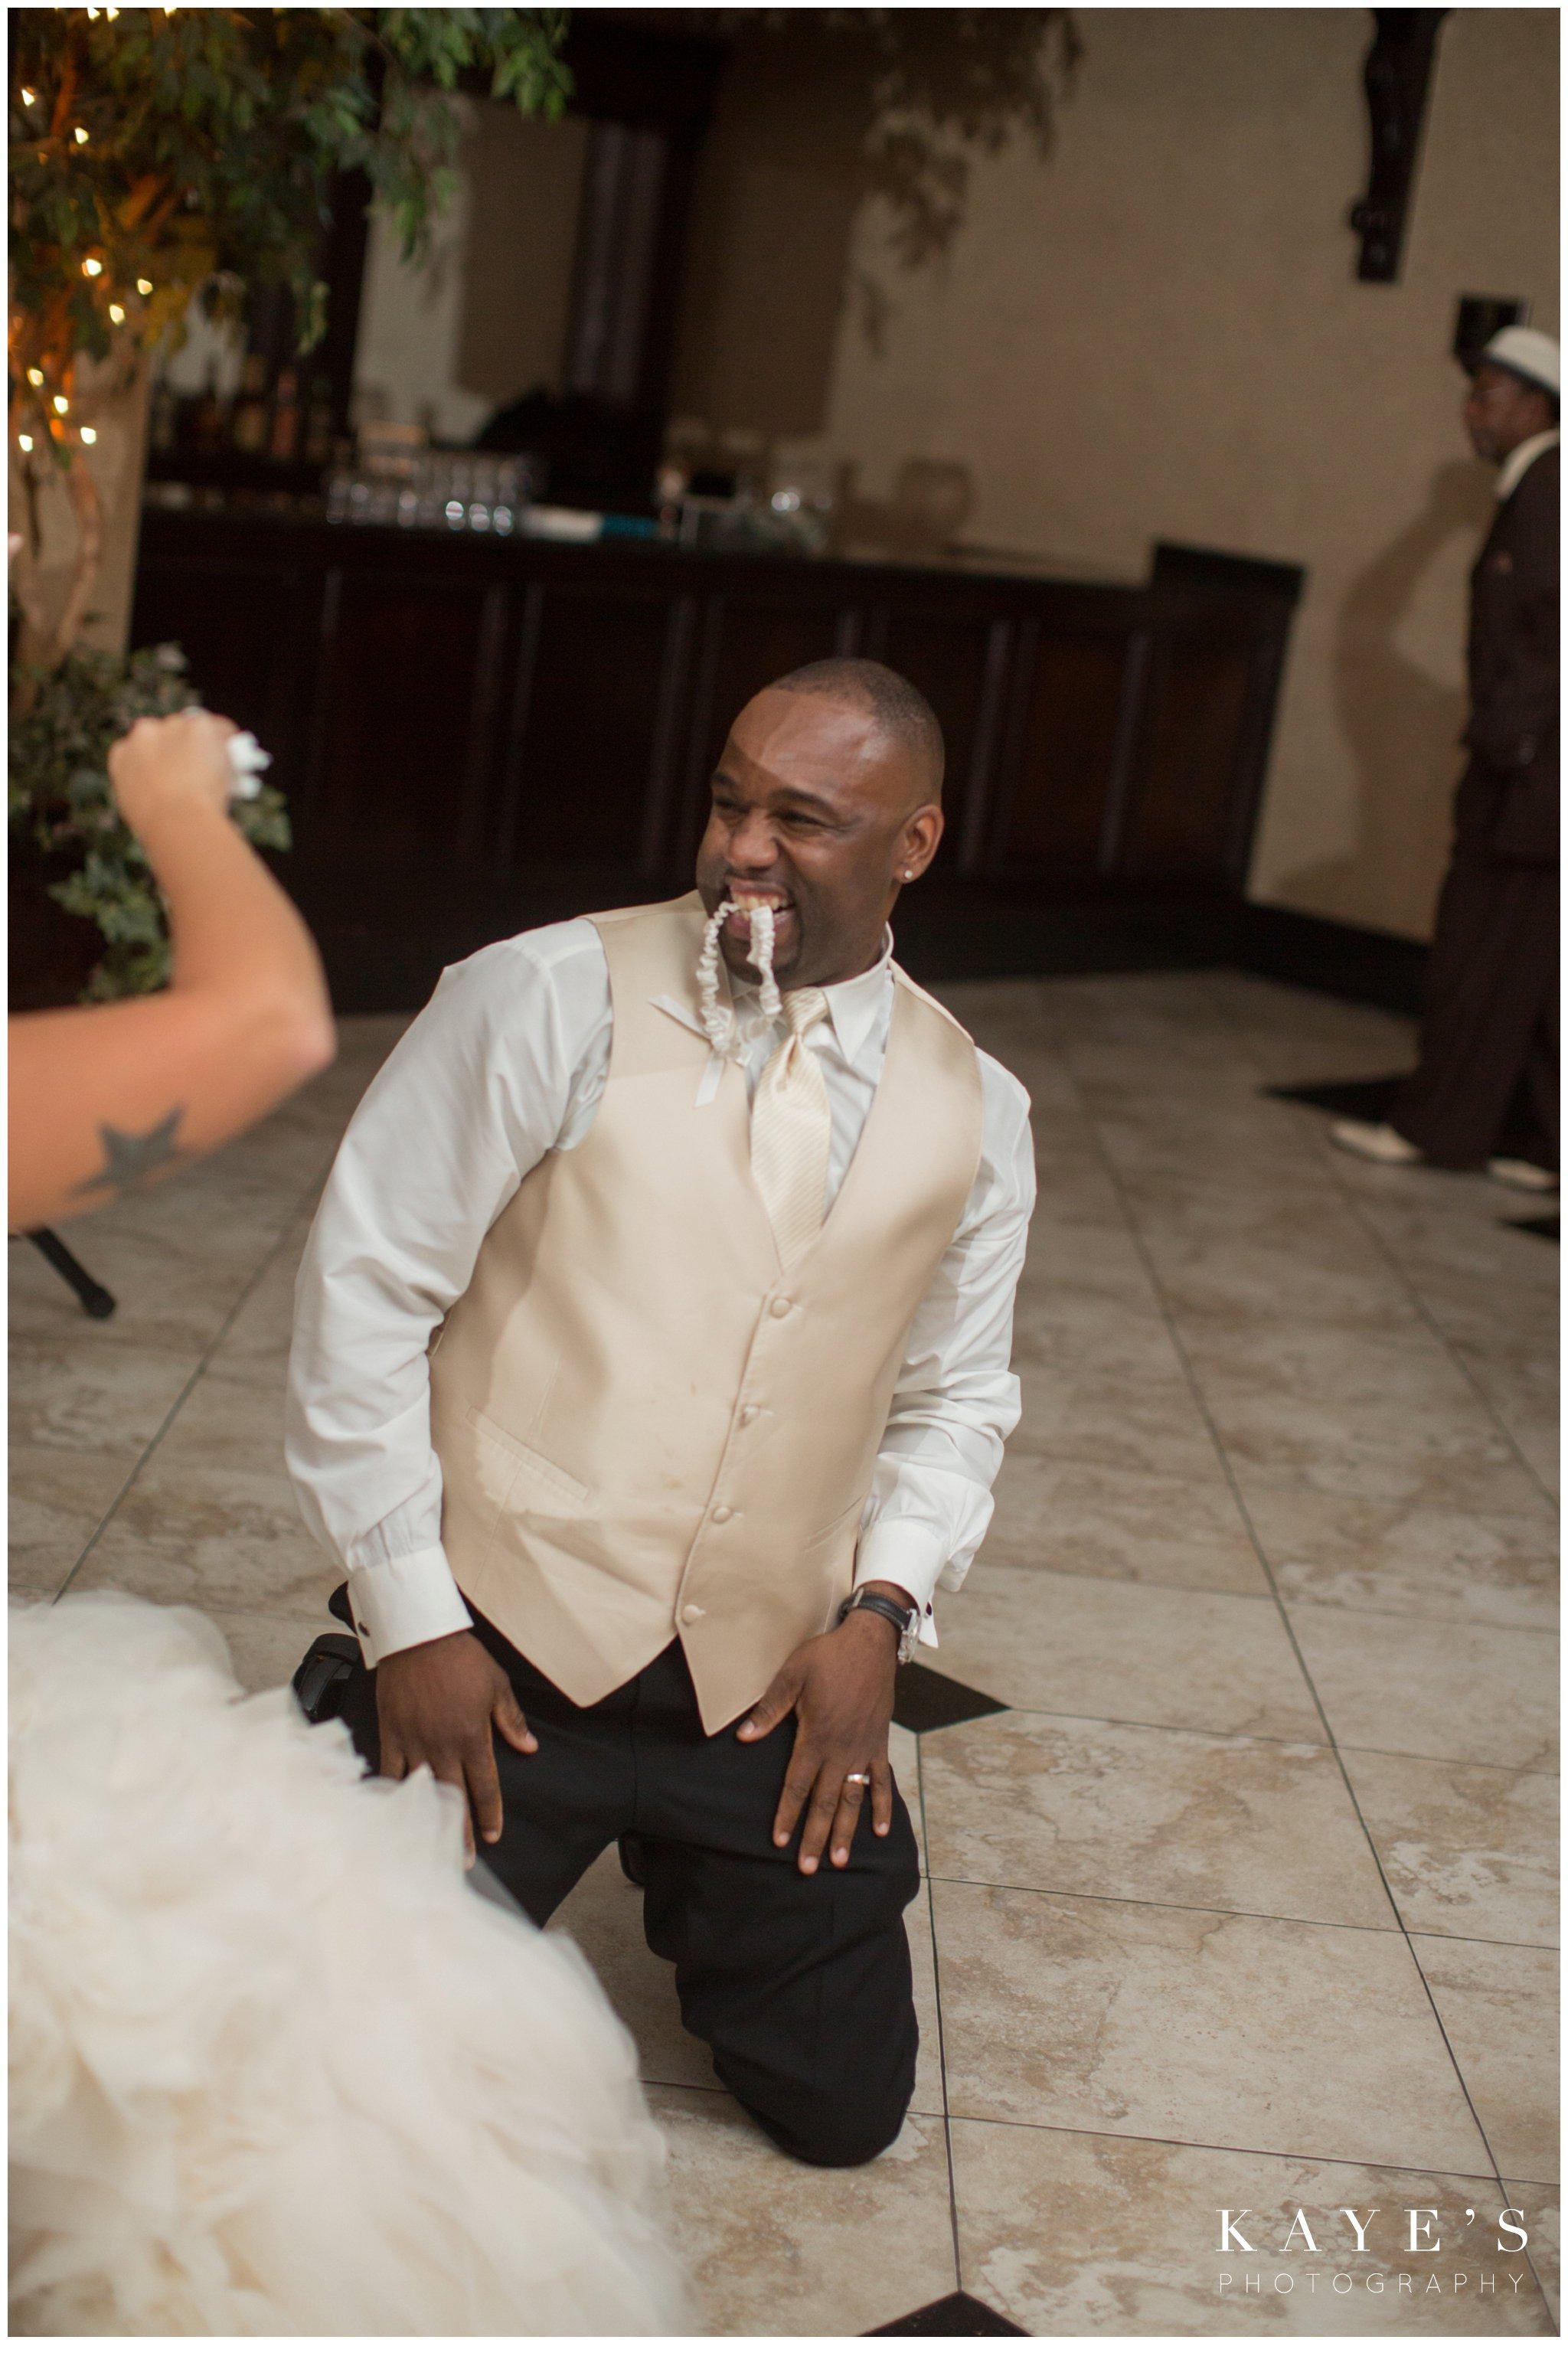 Kayes Photography- howell-michigan-wedding-photographer_0660.jpg